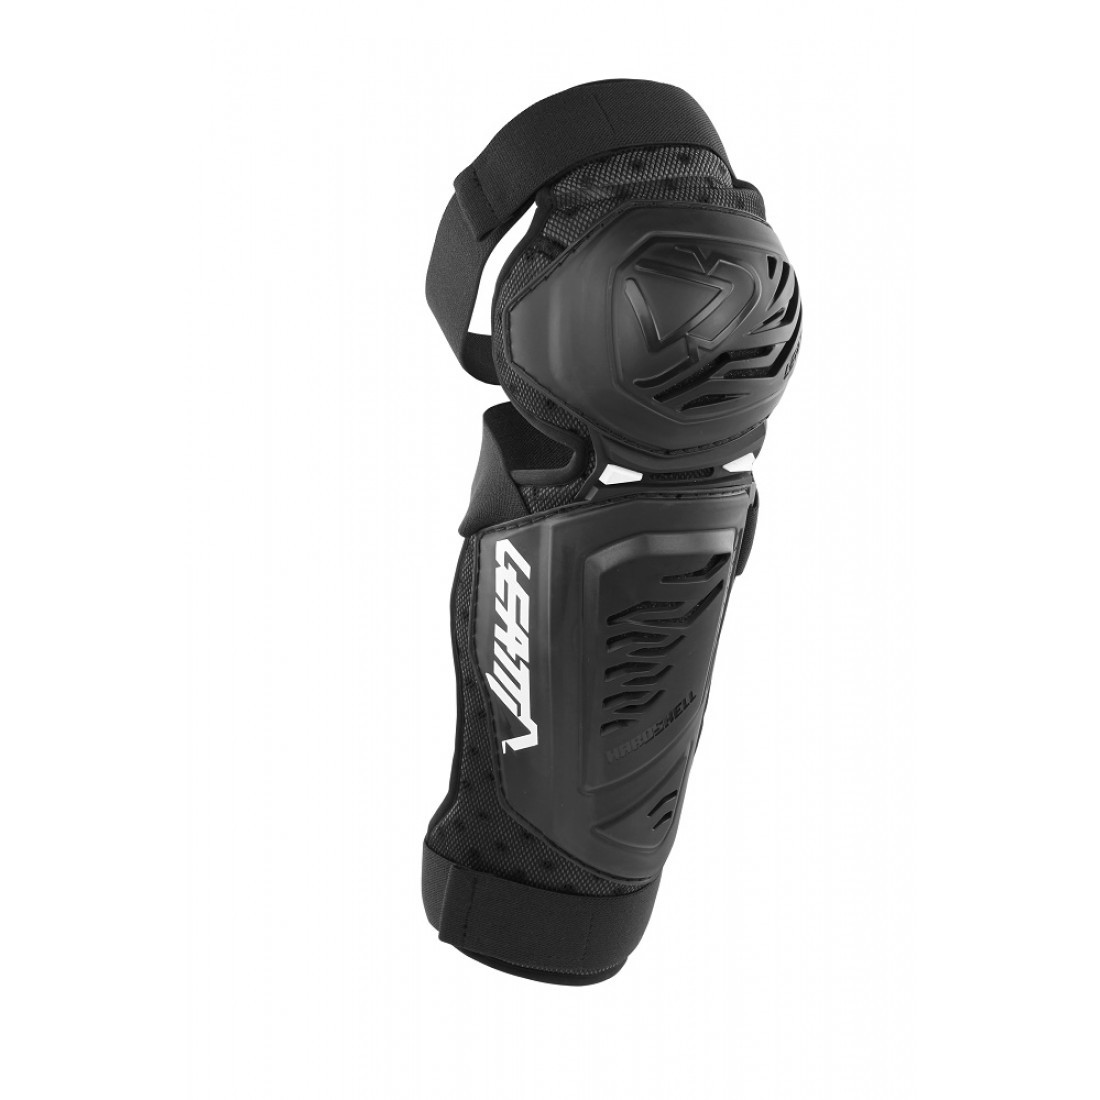 169923199 Chrániče kolen a holení Leatt Knee Shin Guard EXT 3.0 Black vel. XXL ...